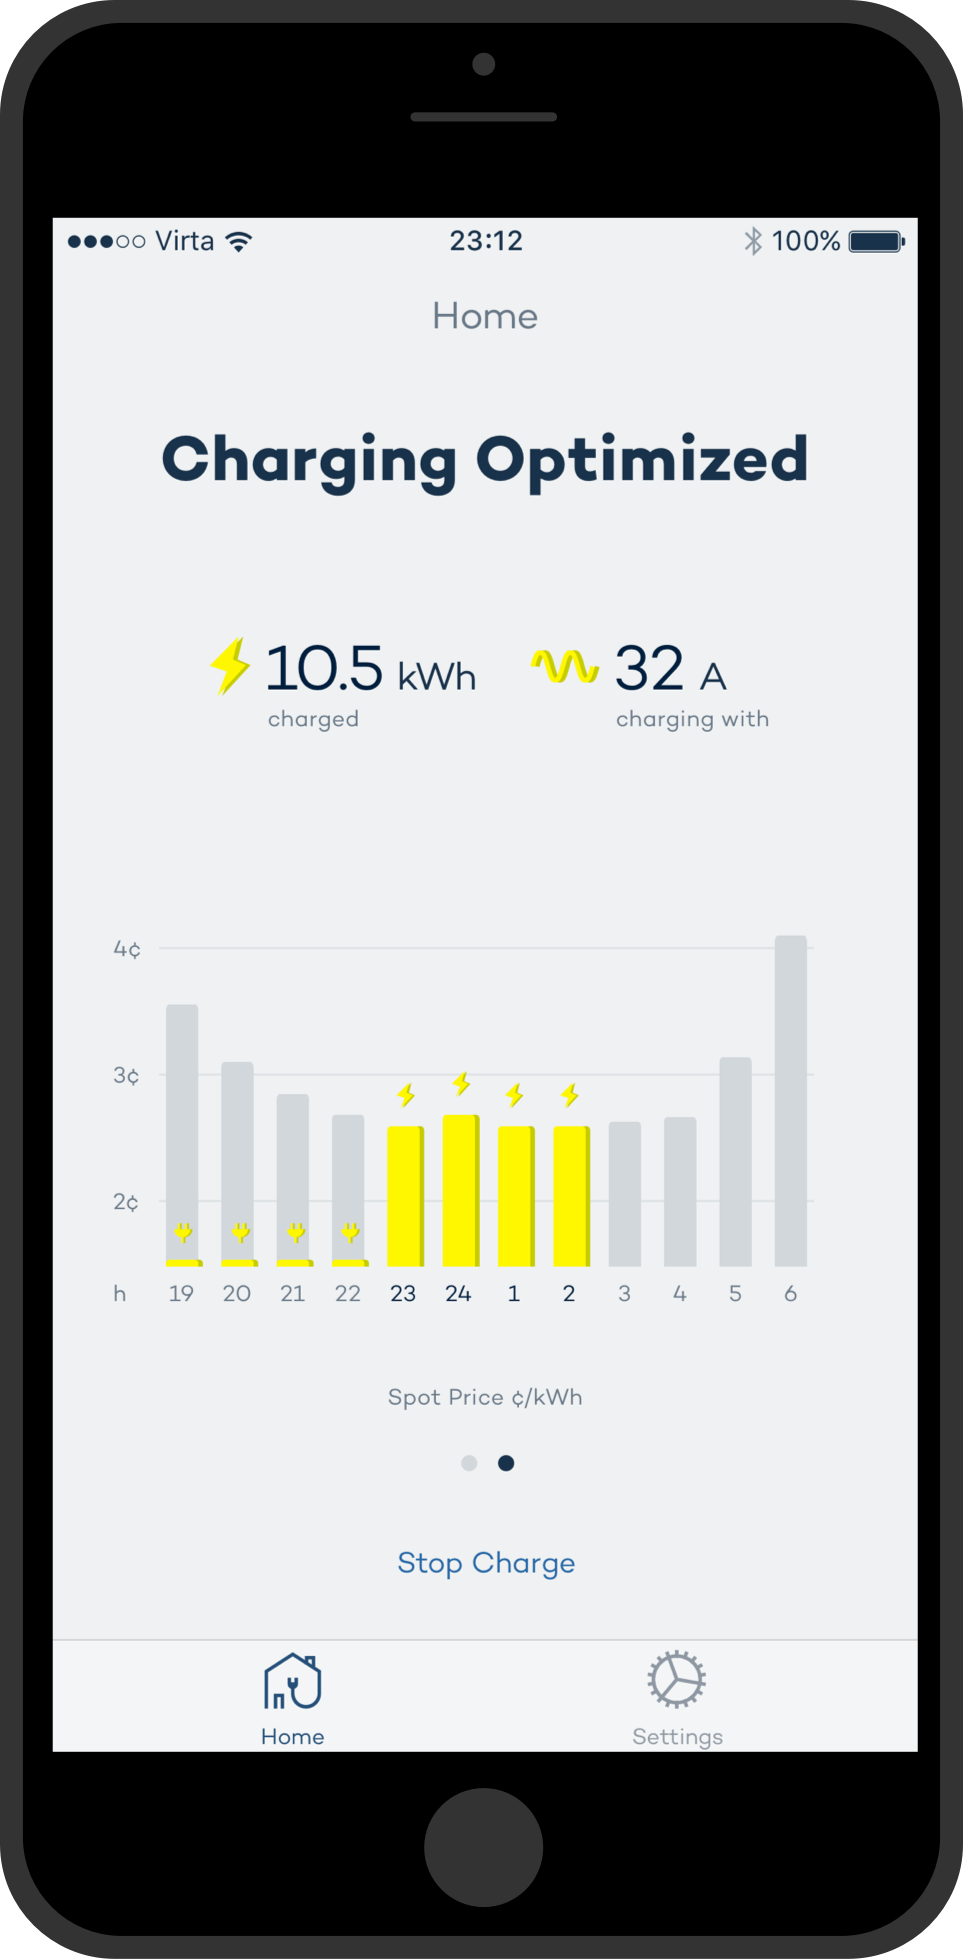 Virta Home Charging Optimized.png